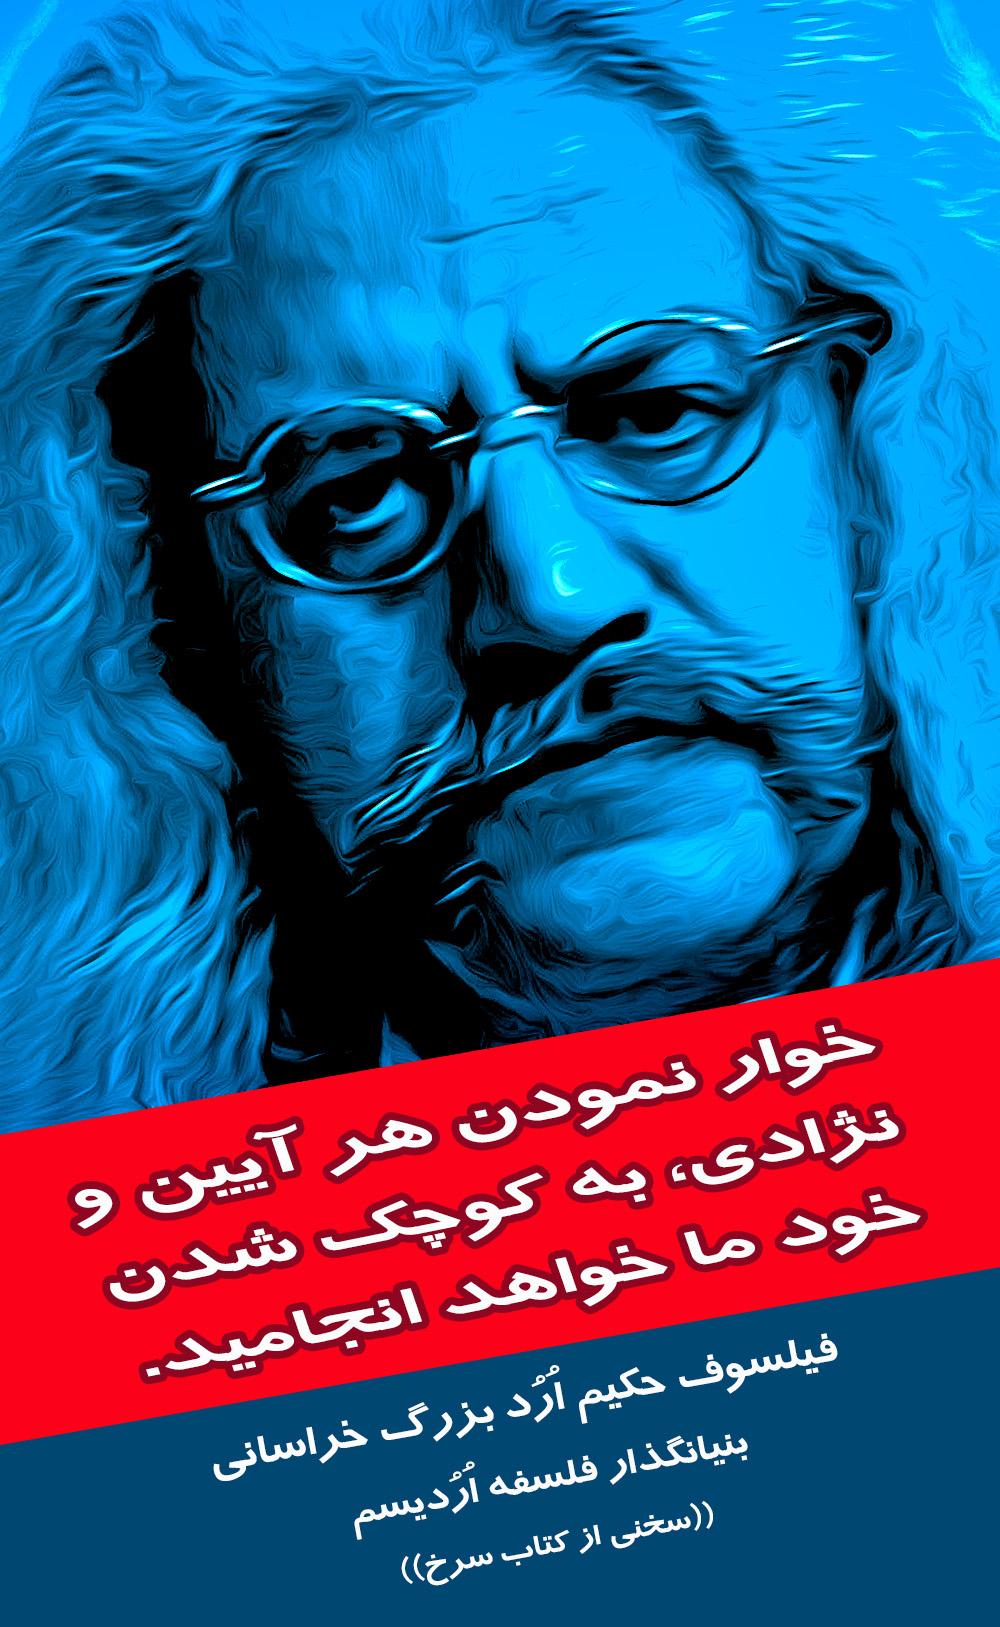 Quotes by The Philosopher Hakim Orod Bozorg Khorasani  47